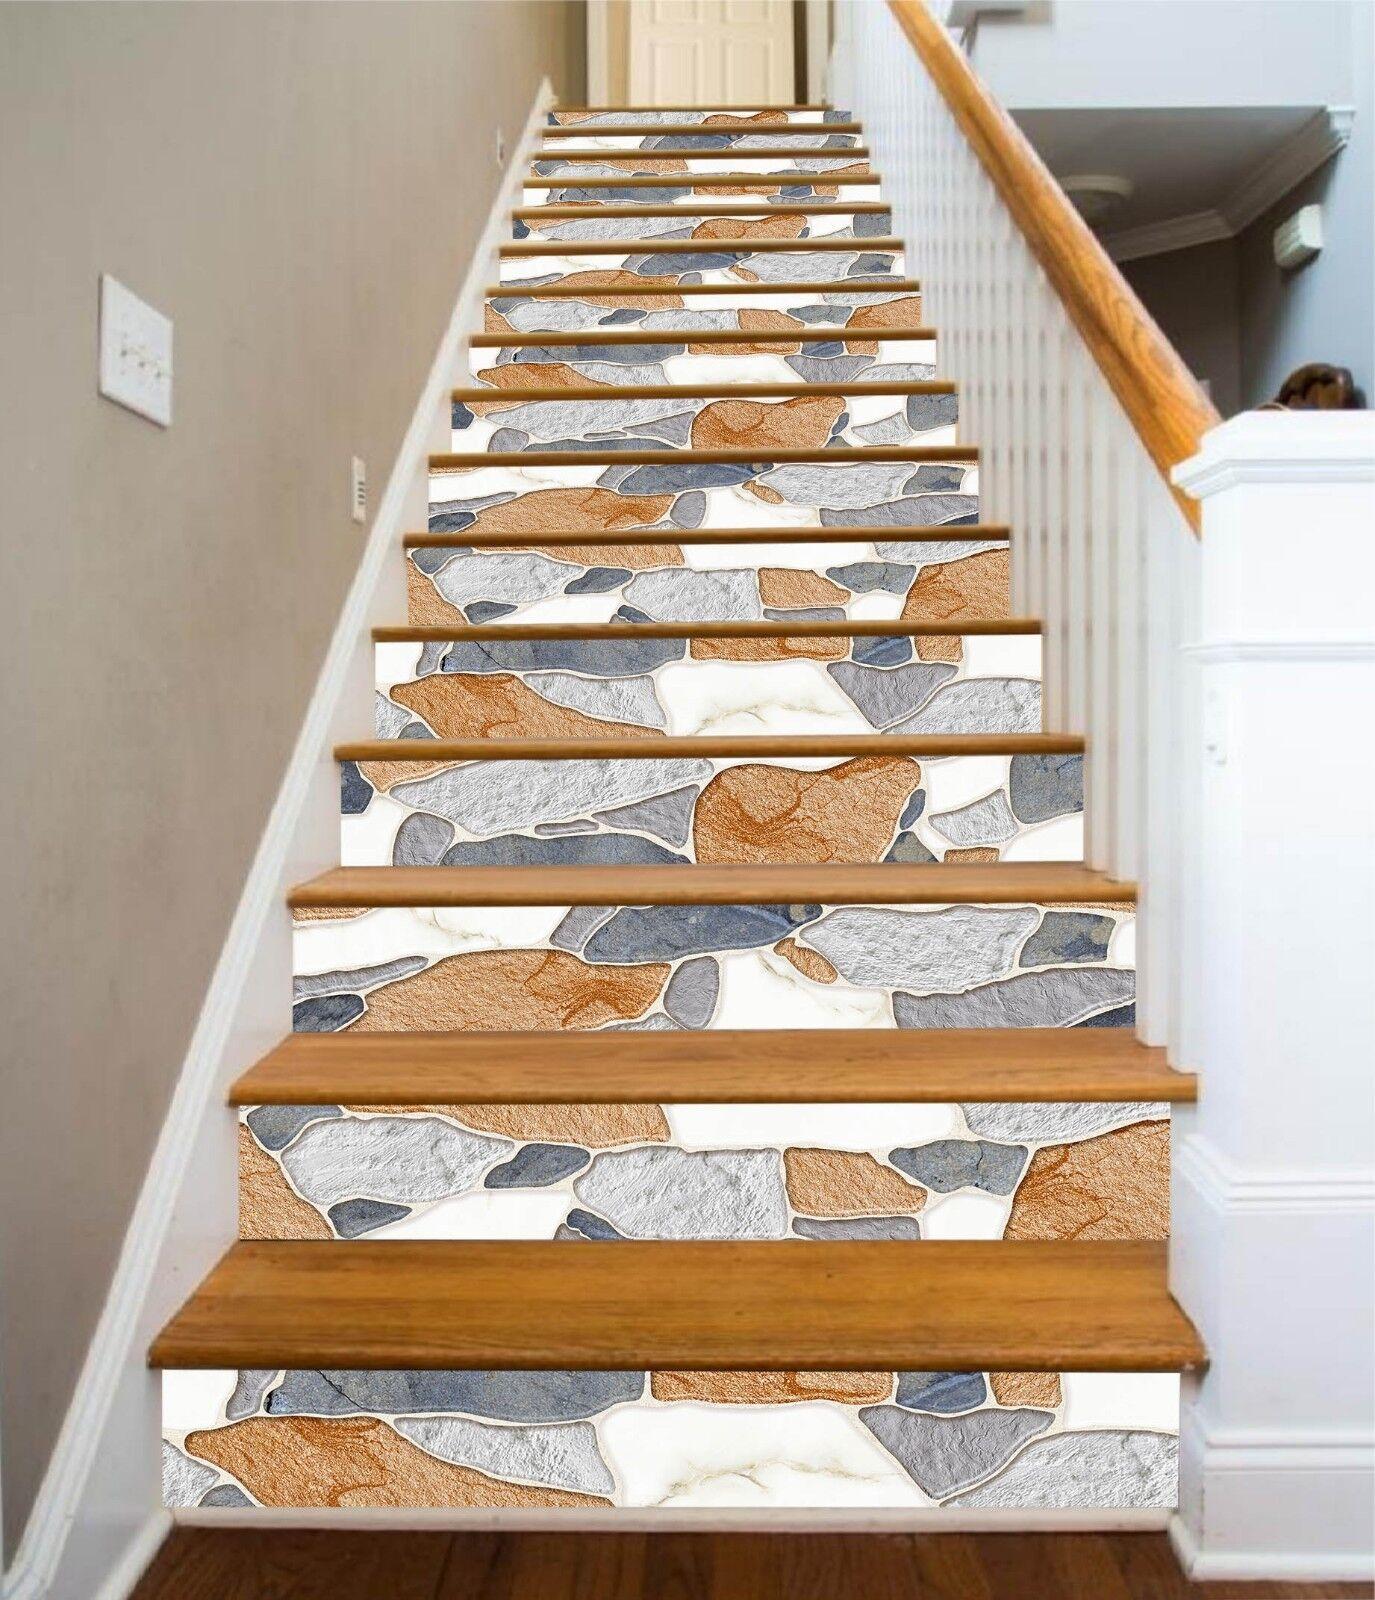 3D Irregulr 7 Fliese Marmor Stair Risers Fototapete Vinyl Aufkleber Tapete